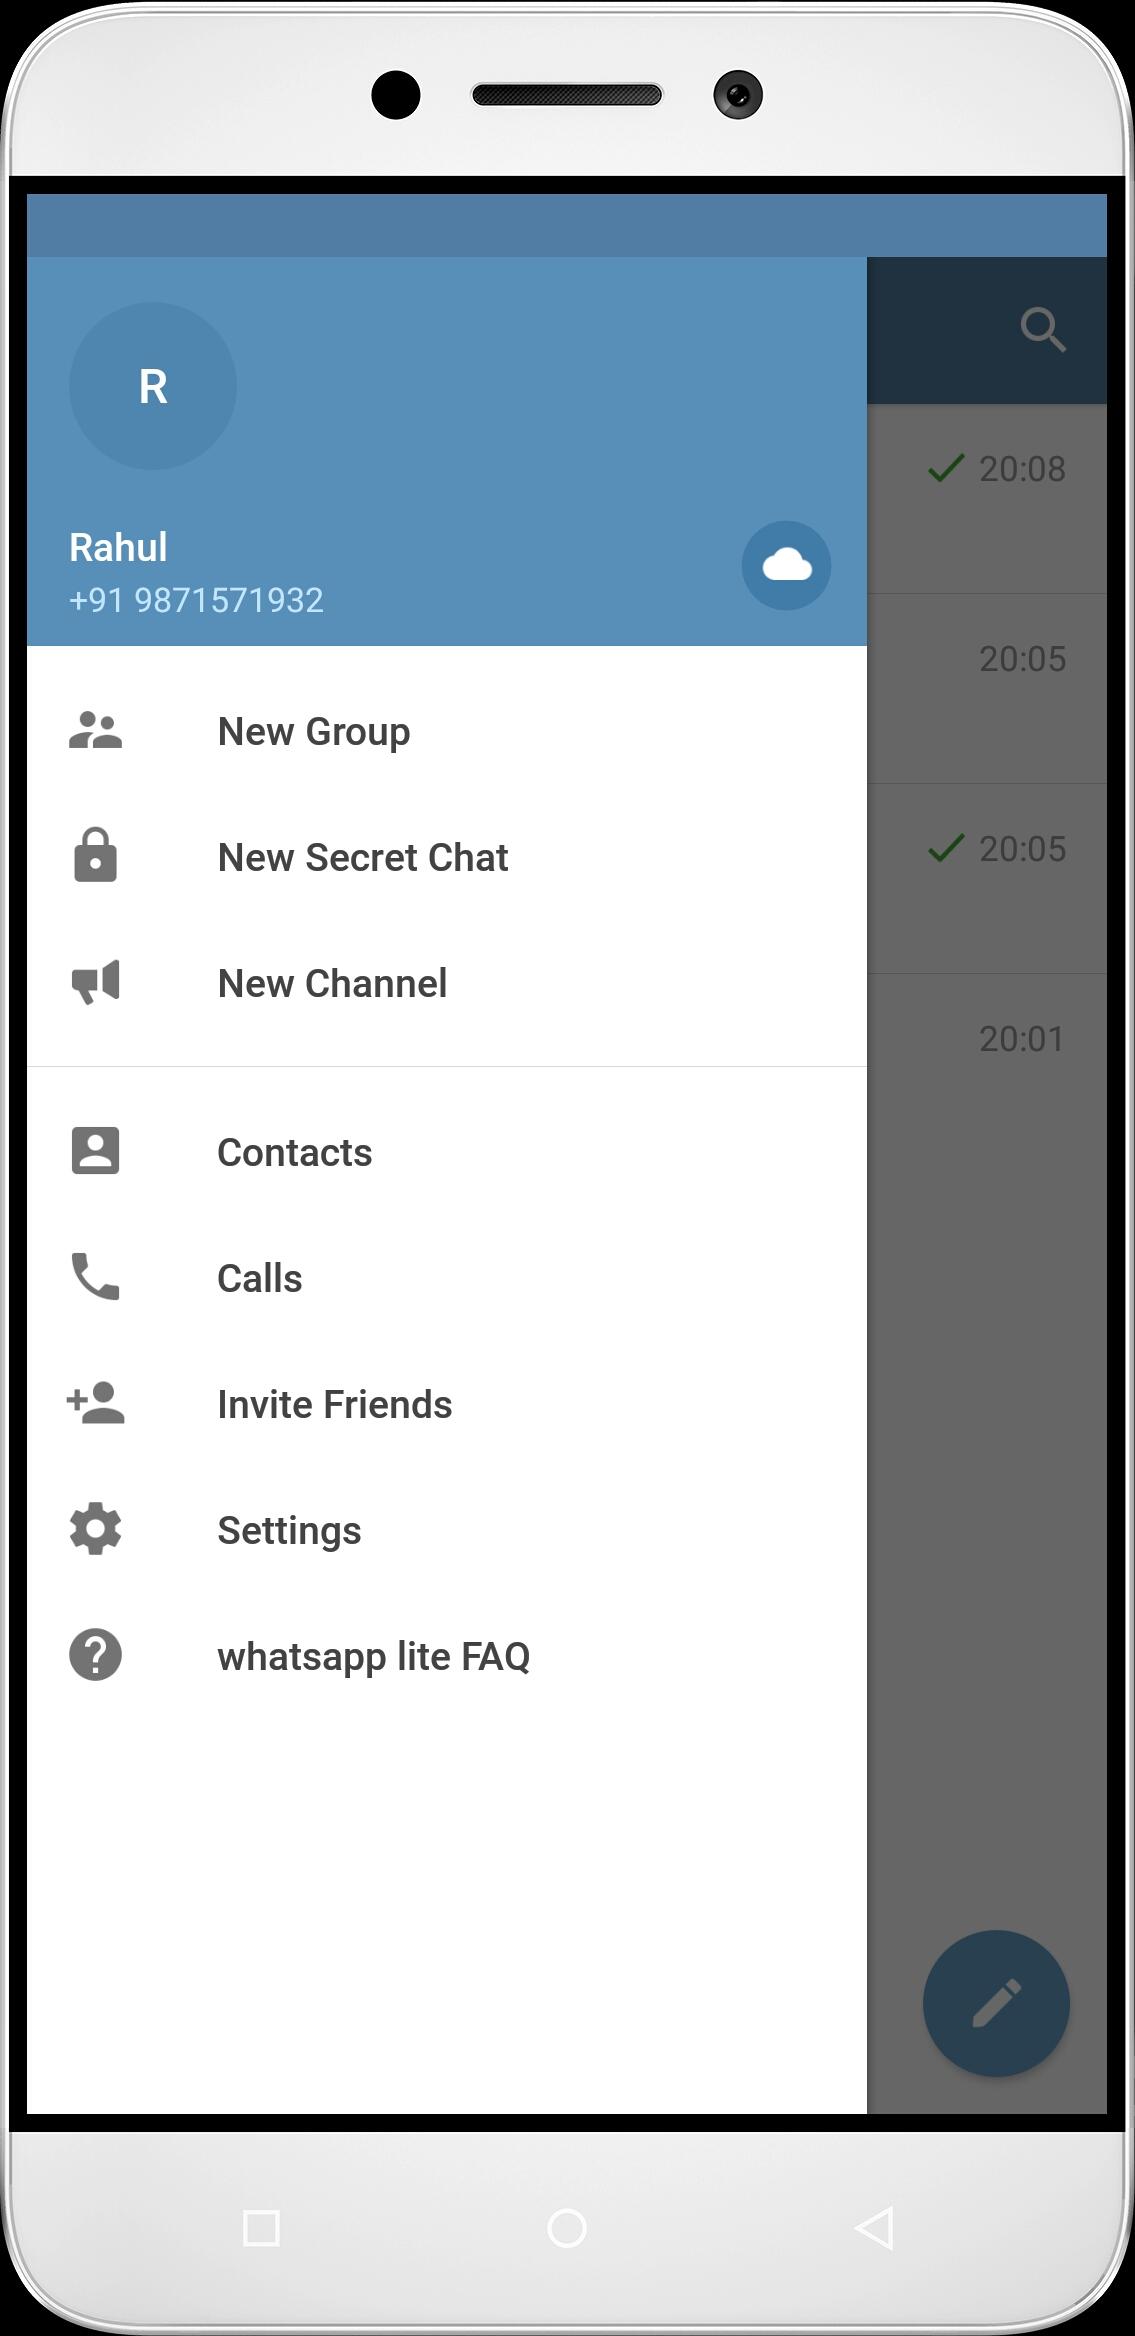 whatsapp lite Android App - Download whatsapp lite